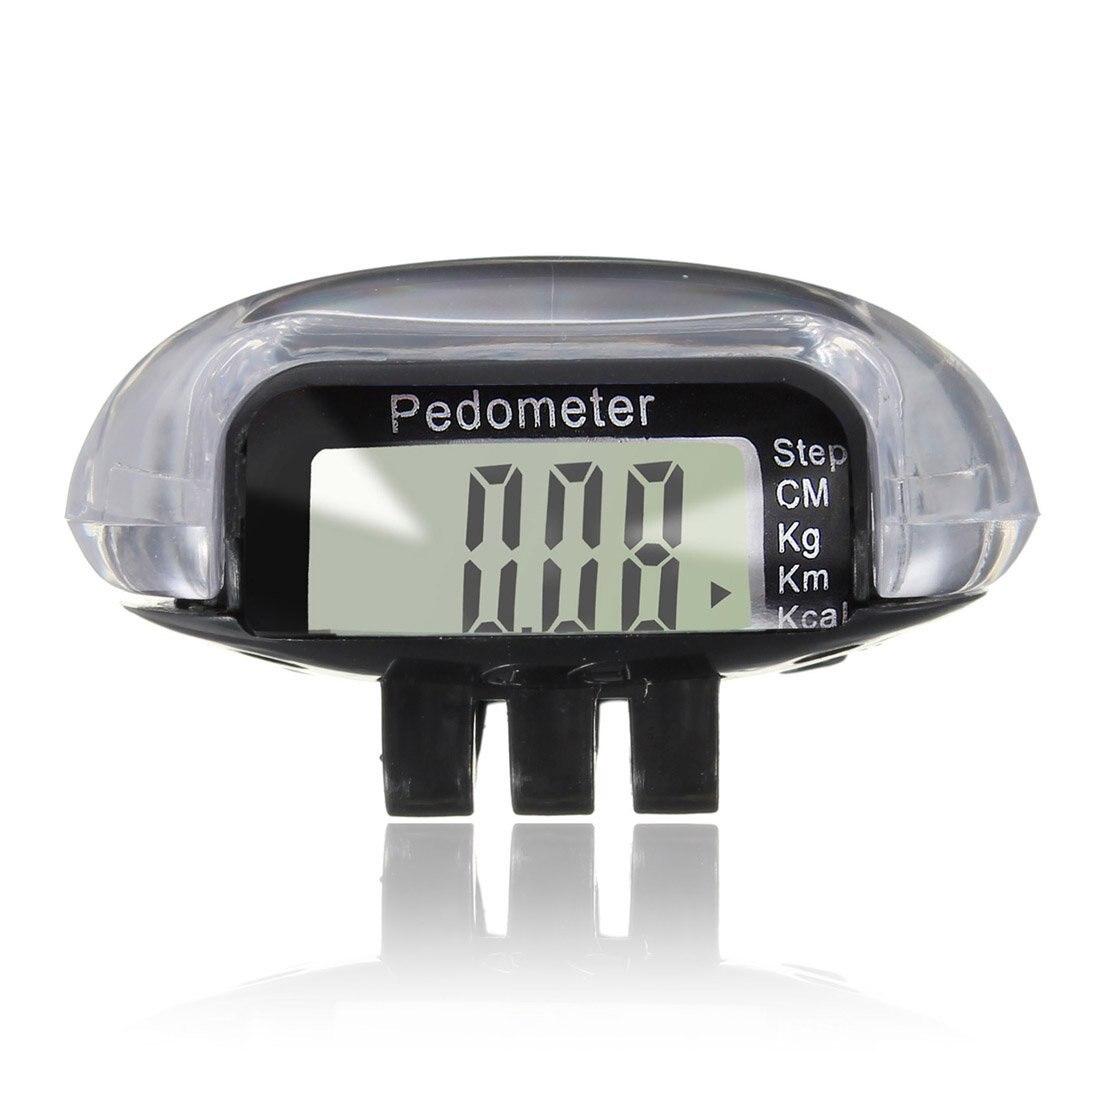 PROMOTION!LCD Digital Multi Pedometer Calorie Counter Run Fitness - Black